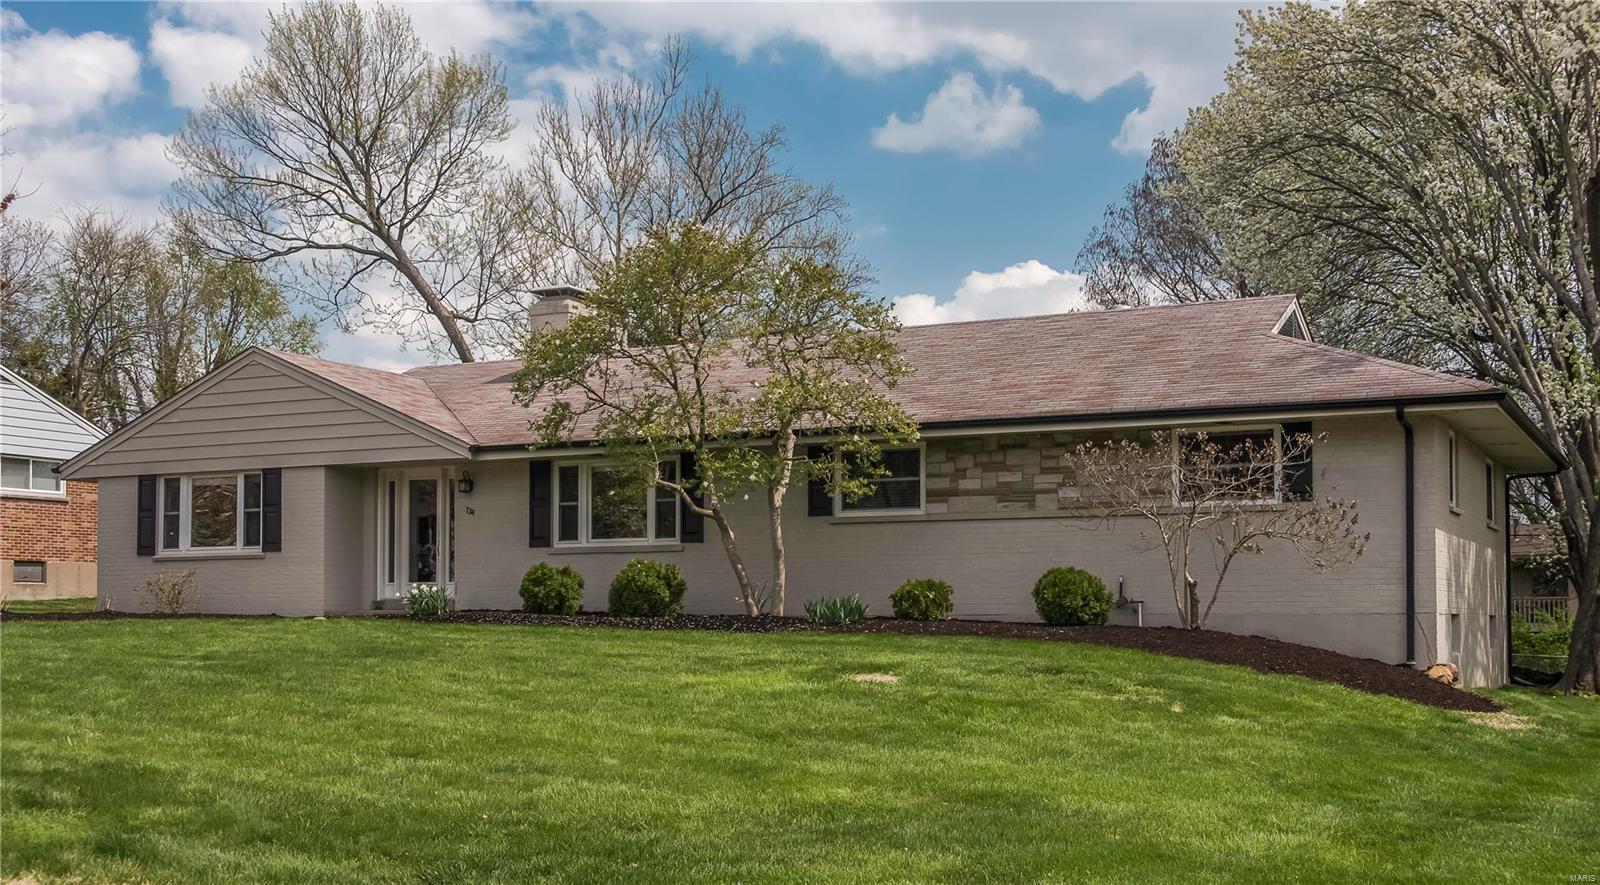 734 Villa Place Ct Property Photo - Olivette, MO real estate listing